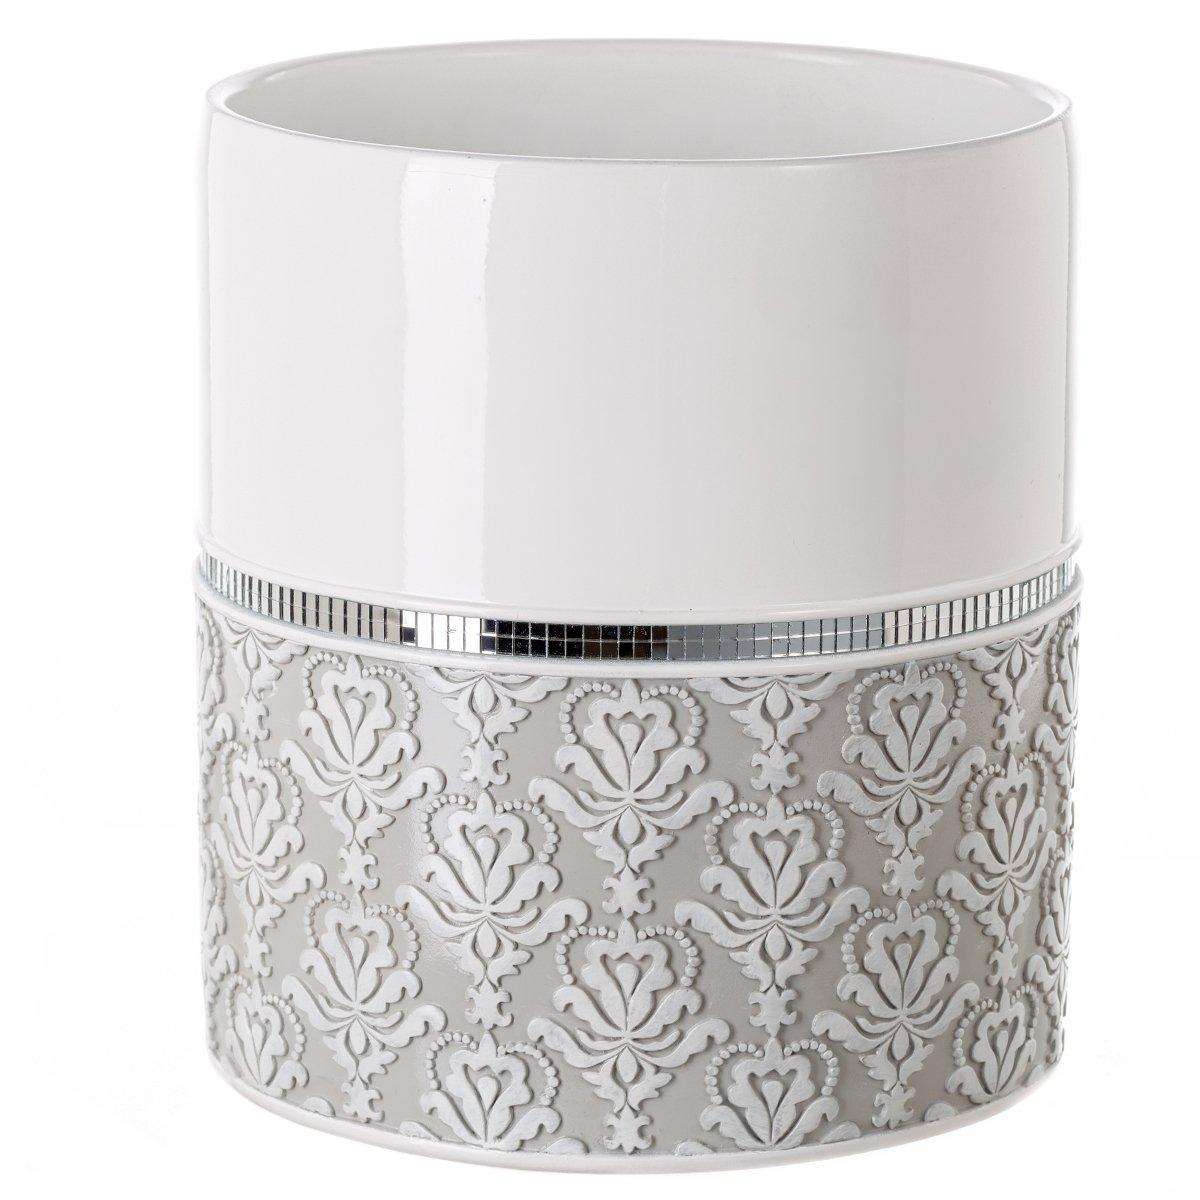 Creative Scents Mirror Damask Bathroom Trash Can, Decorative Wastebasket, Design- Space Friendly Bath Rubbish Dust Bin (Grey & White) by Creative Scents